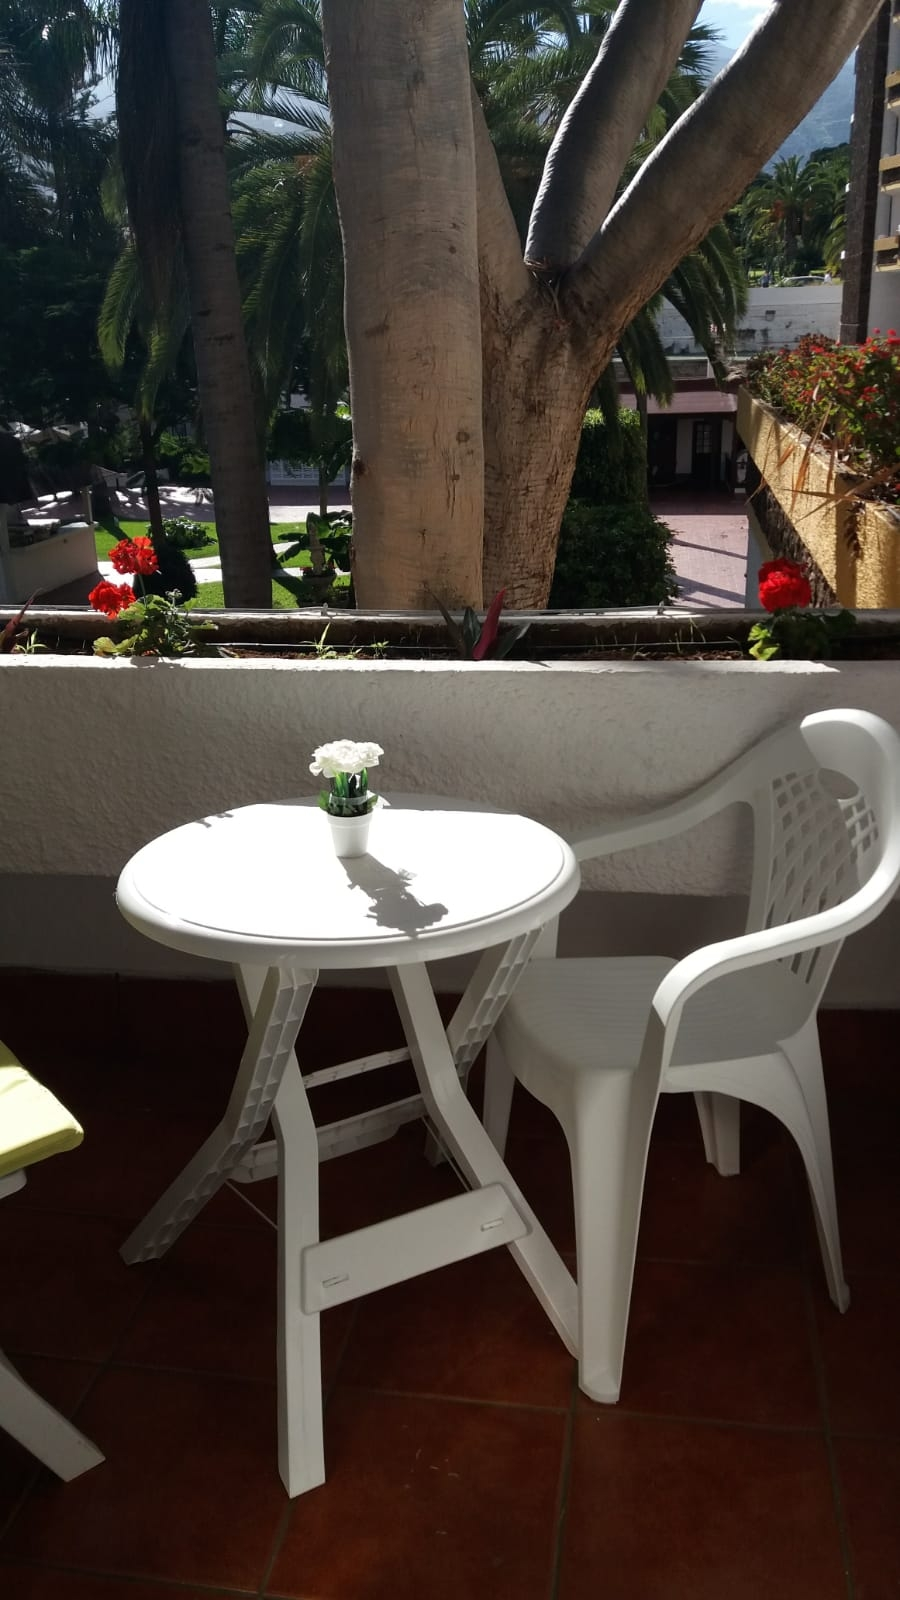 [AP-160] Apartment with two studio apartments in Puerto de la Cruz